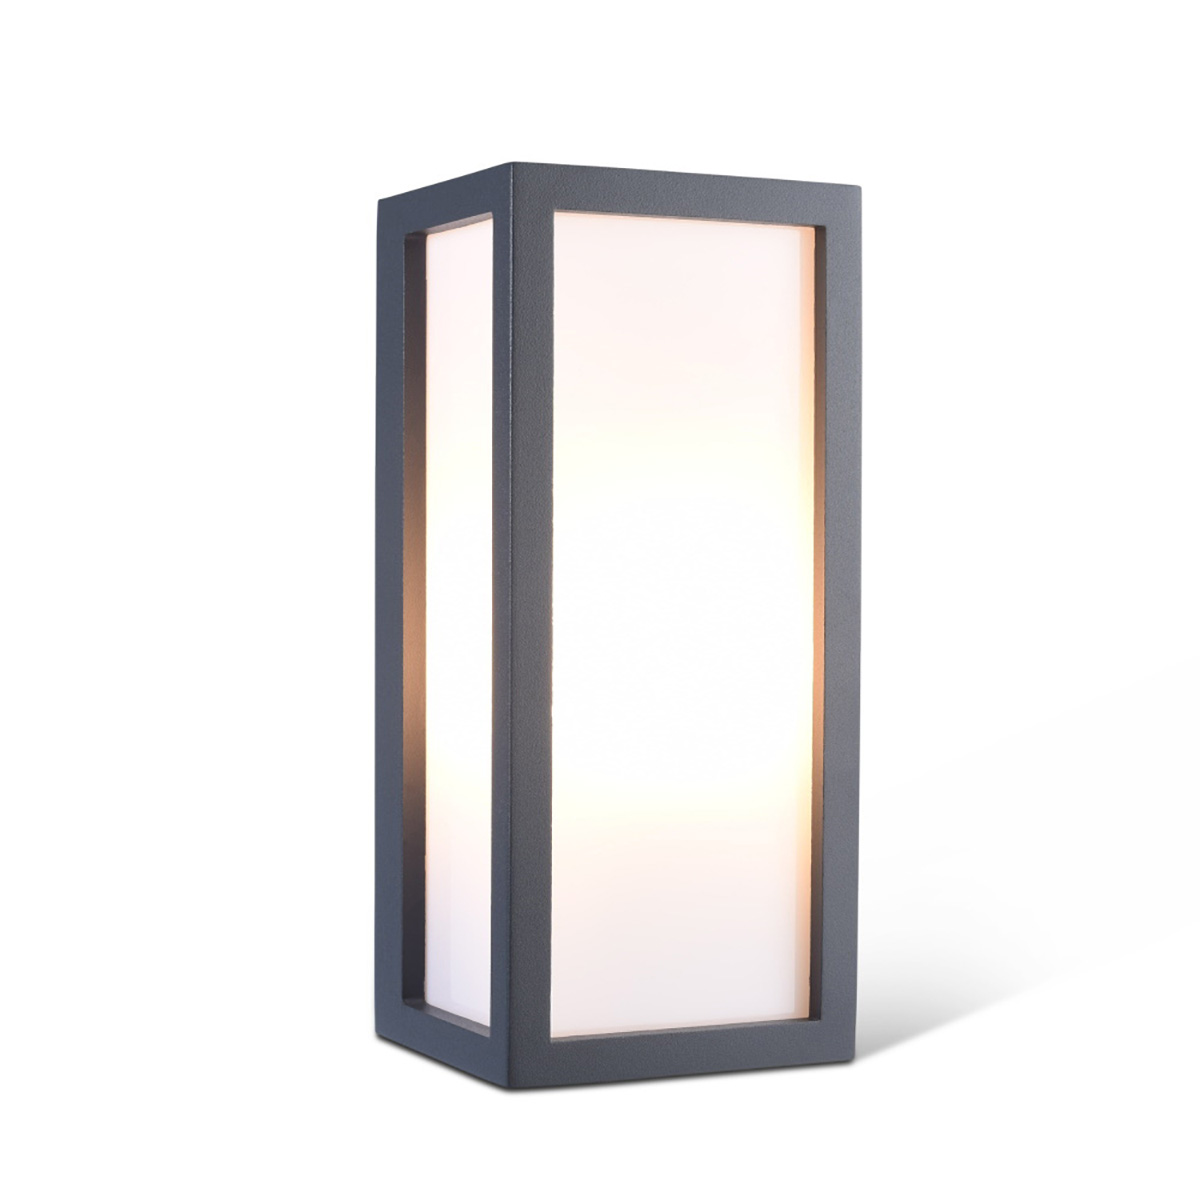 Outdoor Wall Lights LED  Modern Lighting Garden Patio Integral LED